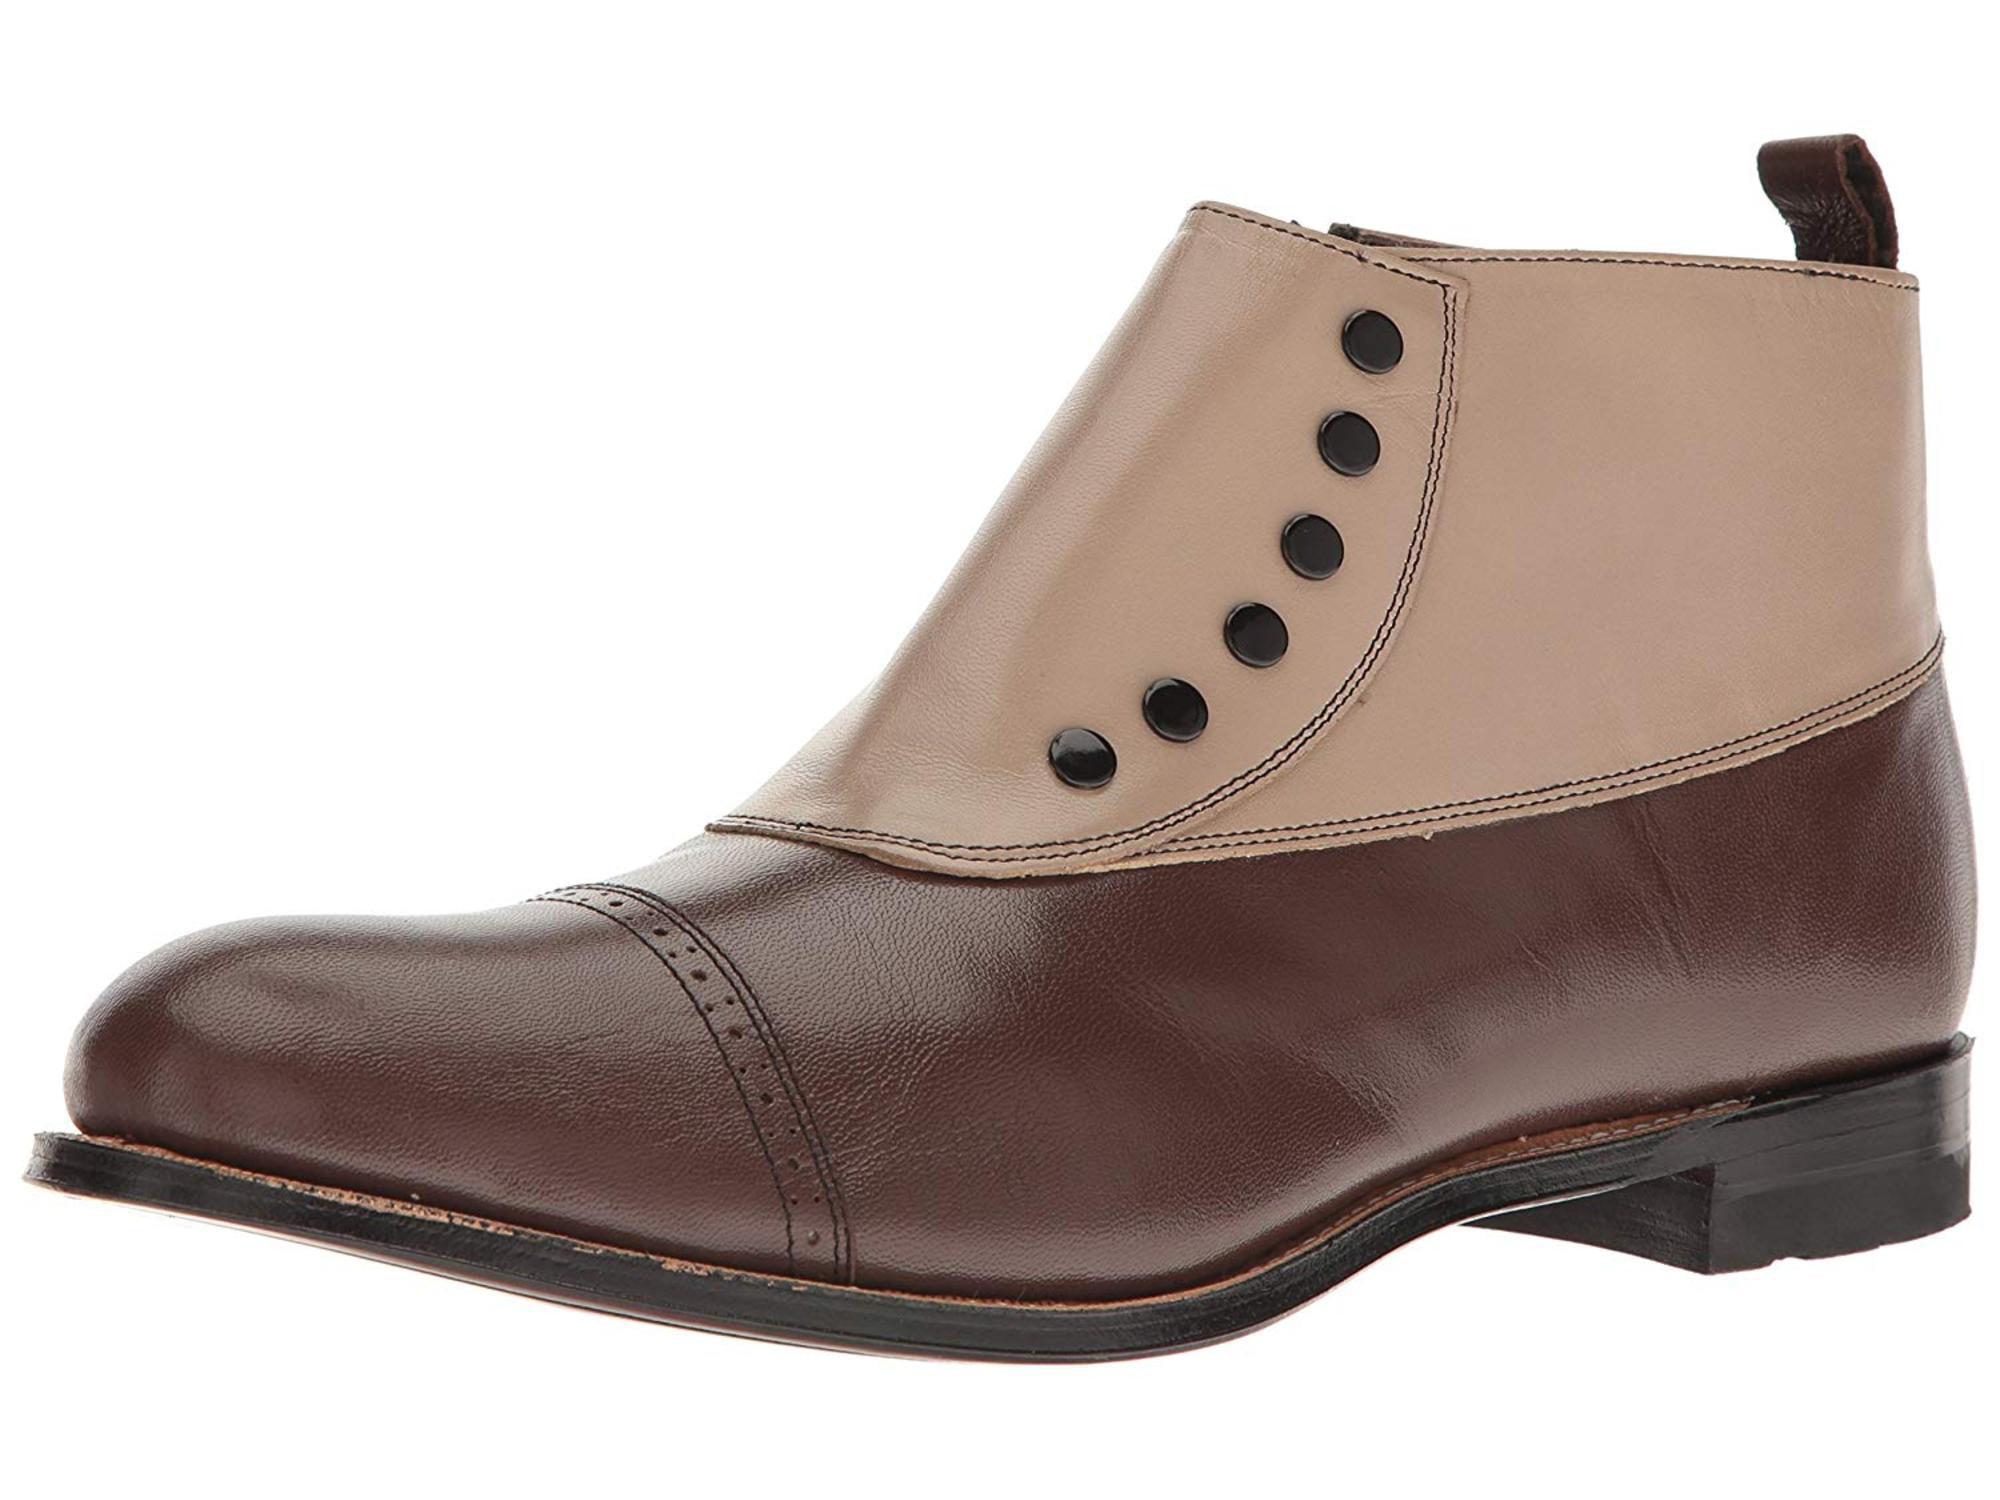 d4d513090b0 Stacy Adams Men's Madison Cap-Toe Spat Boot, Brown, Size 7.5